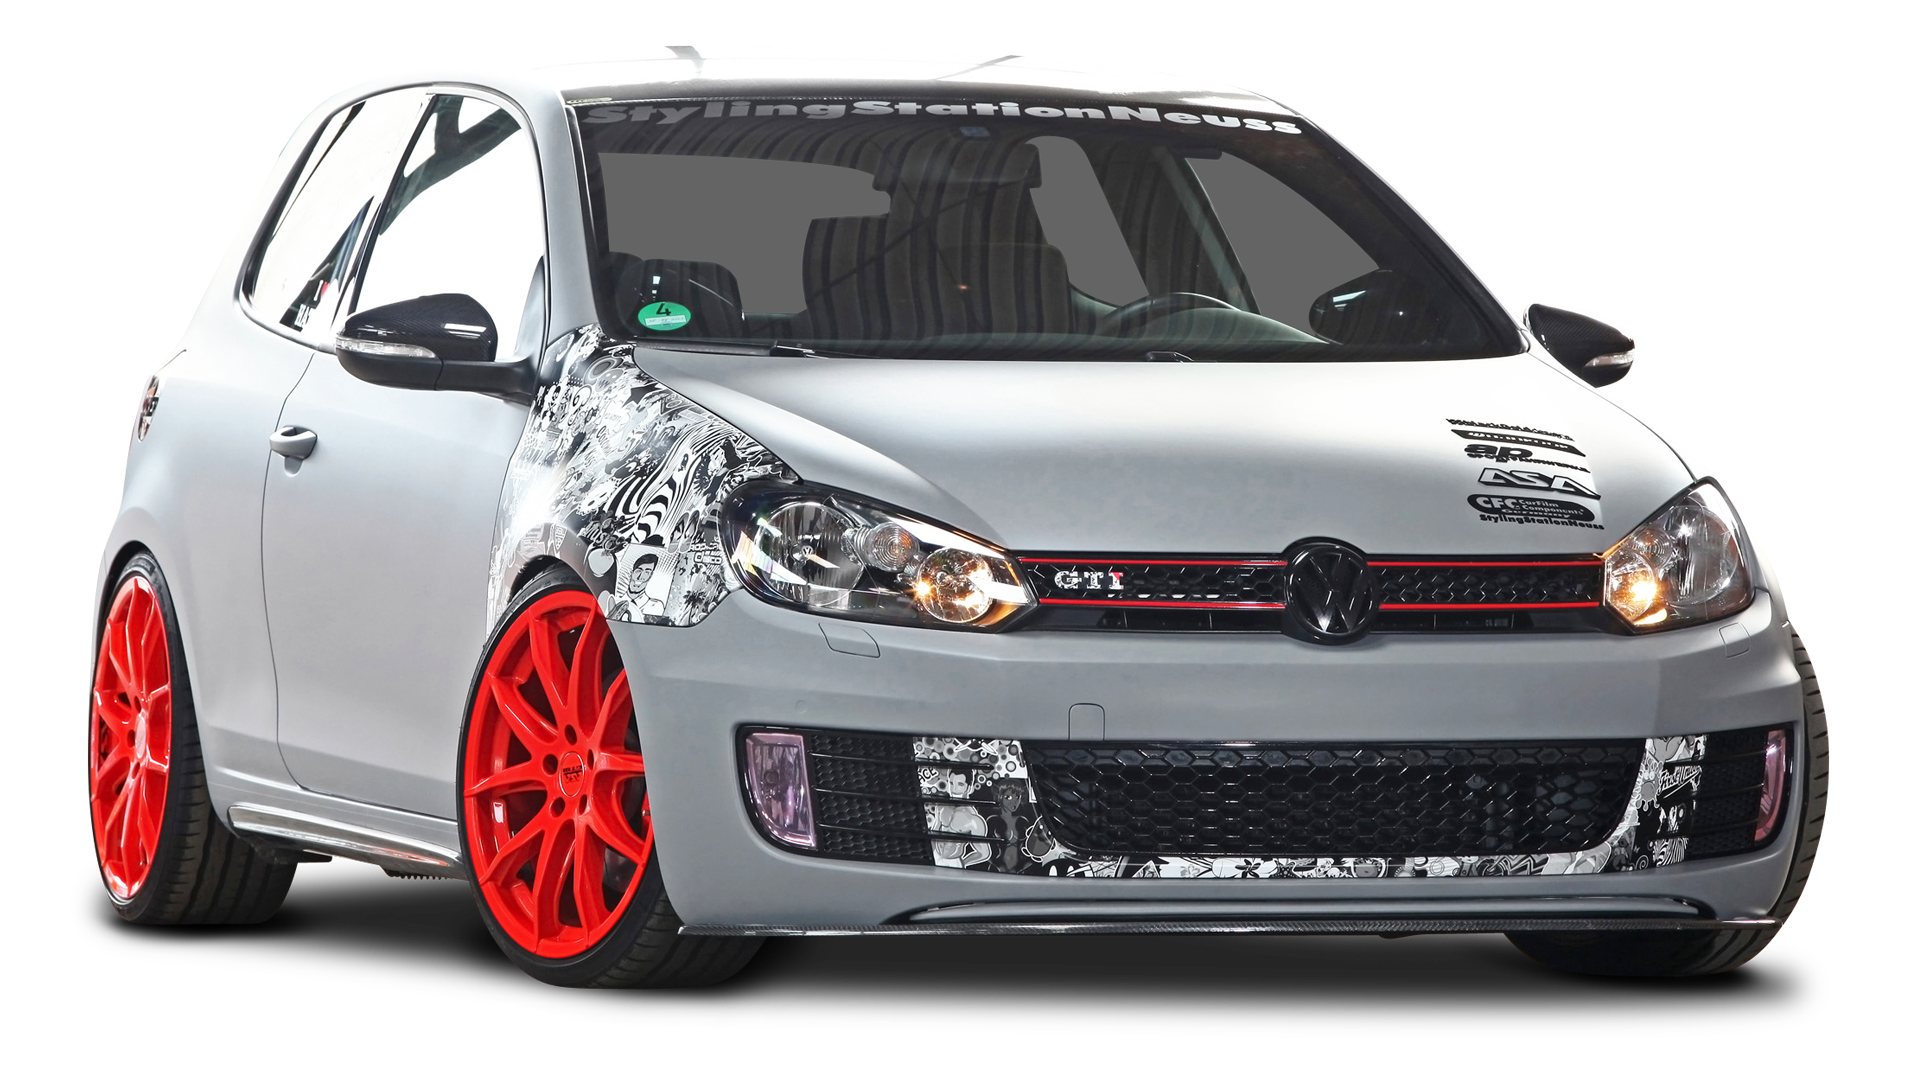 Volkswagen Golf VI GTI Car PNG Image.